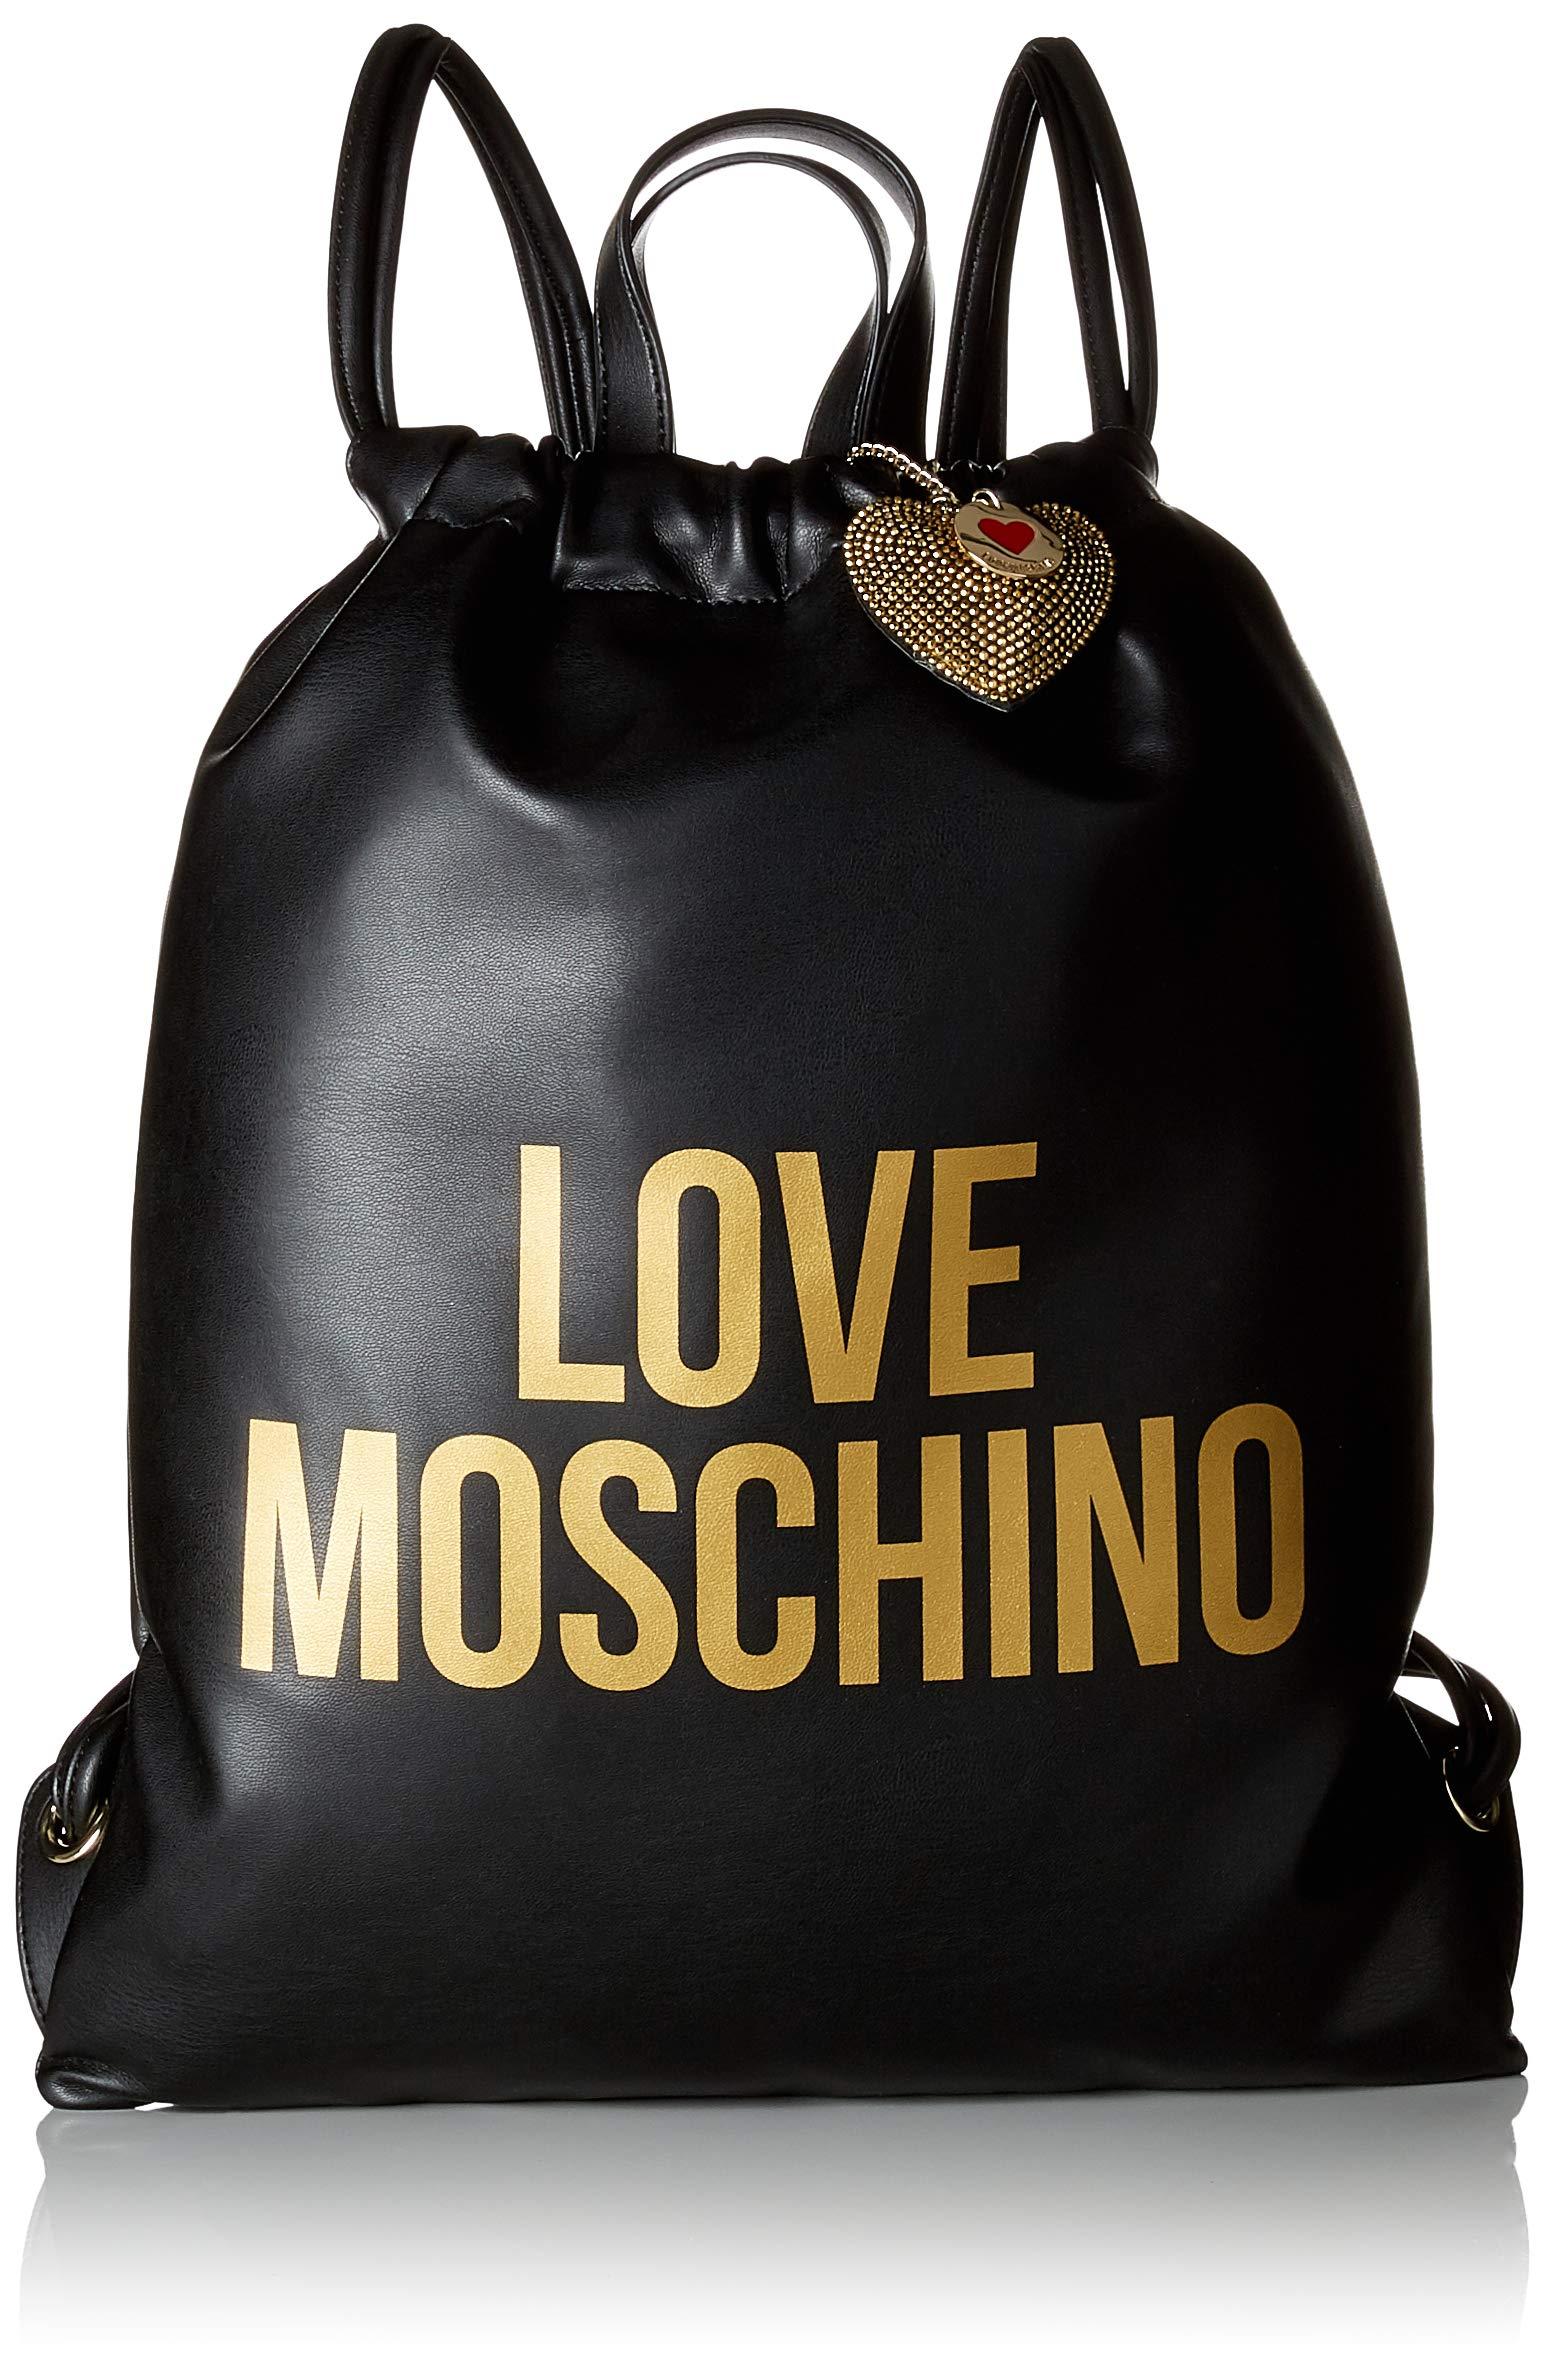 Love Moschino Borsa Pu, Women's Backpack Handbag, Black (Nero-Stampato Oro), 1x41x35 cm (B x H T)